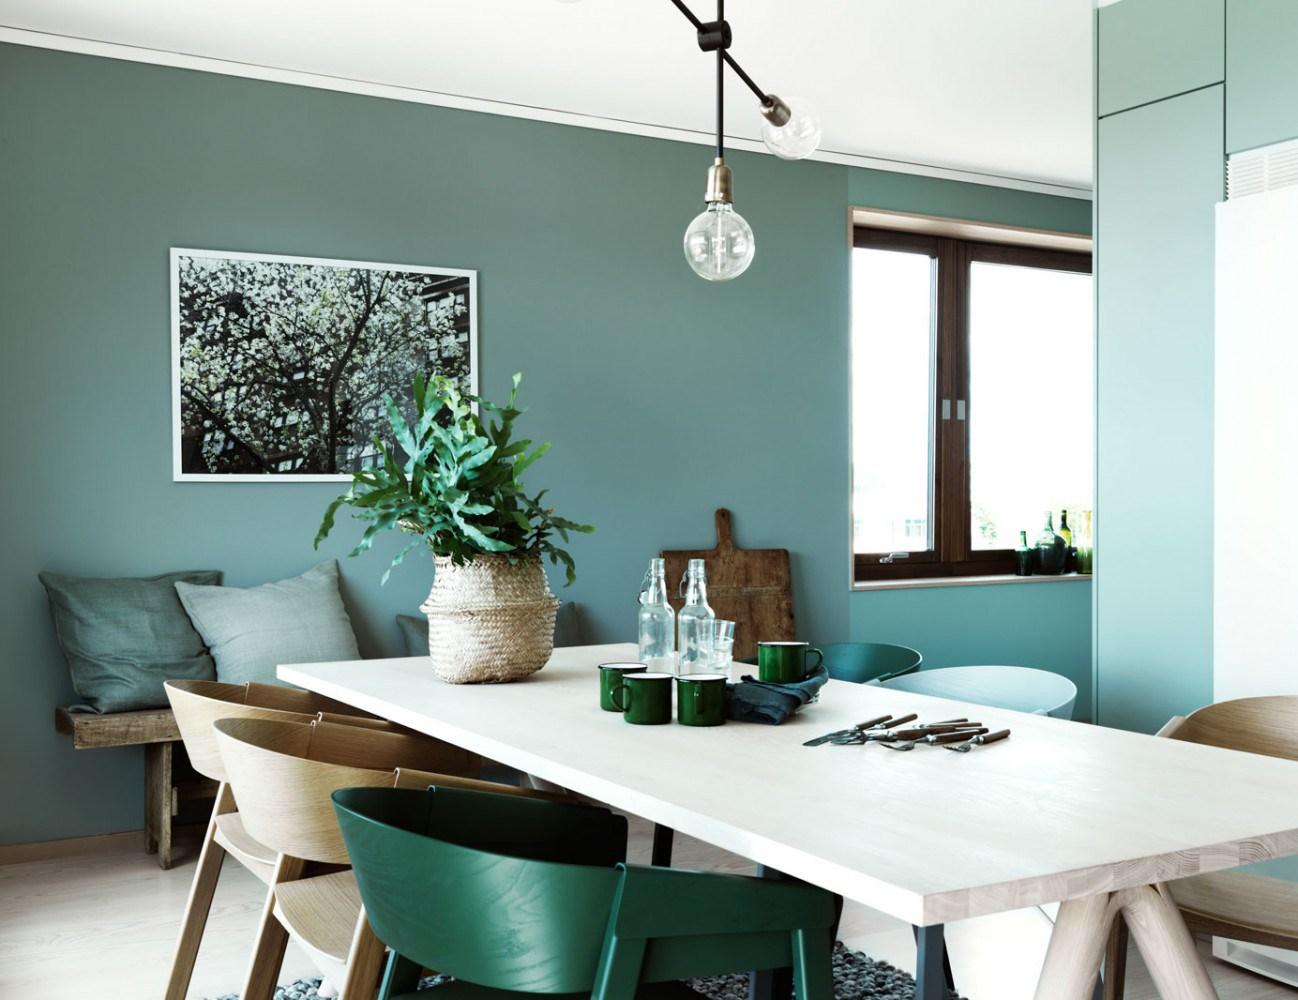 deco-interieur-peinture-vert-kaki-green-attitude-look-style-nordique-scandinave-moderne-FrenchyFancy-5